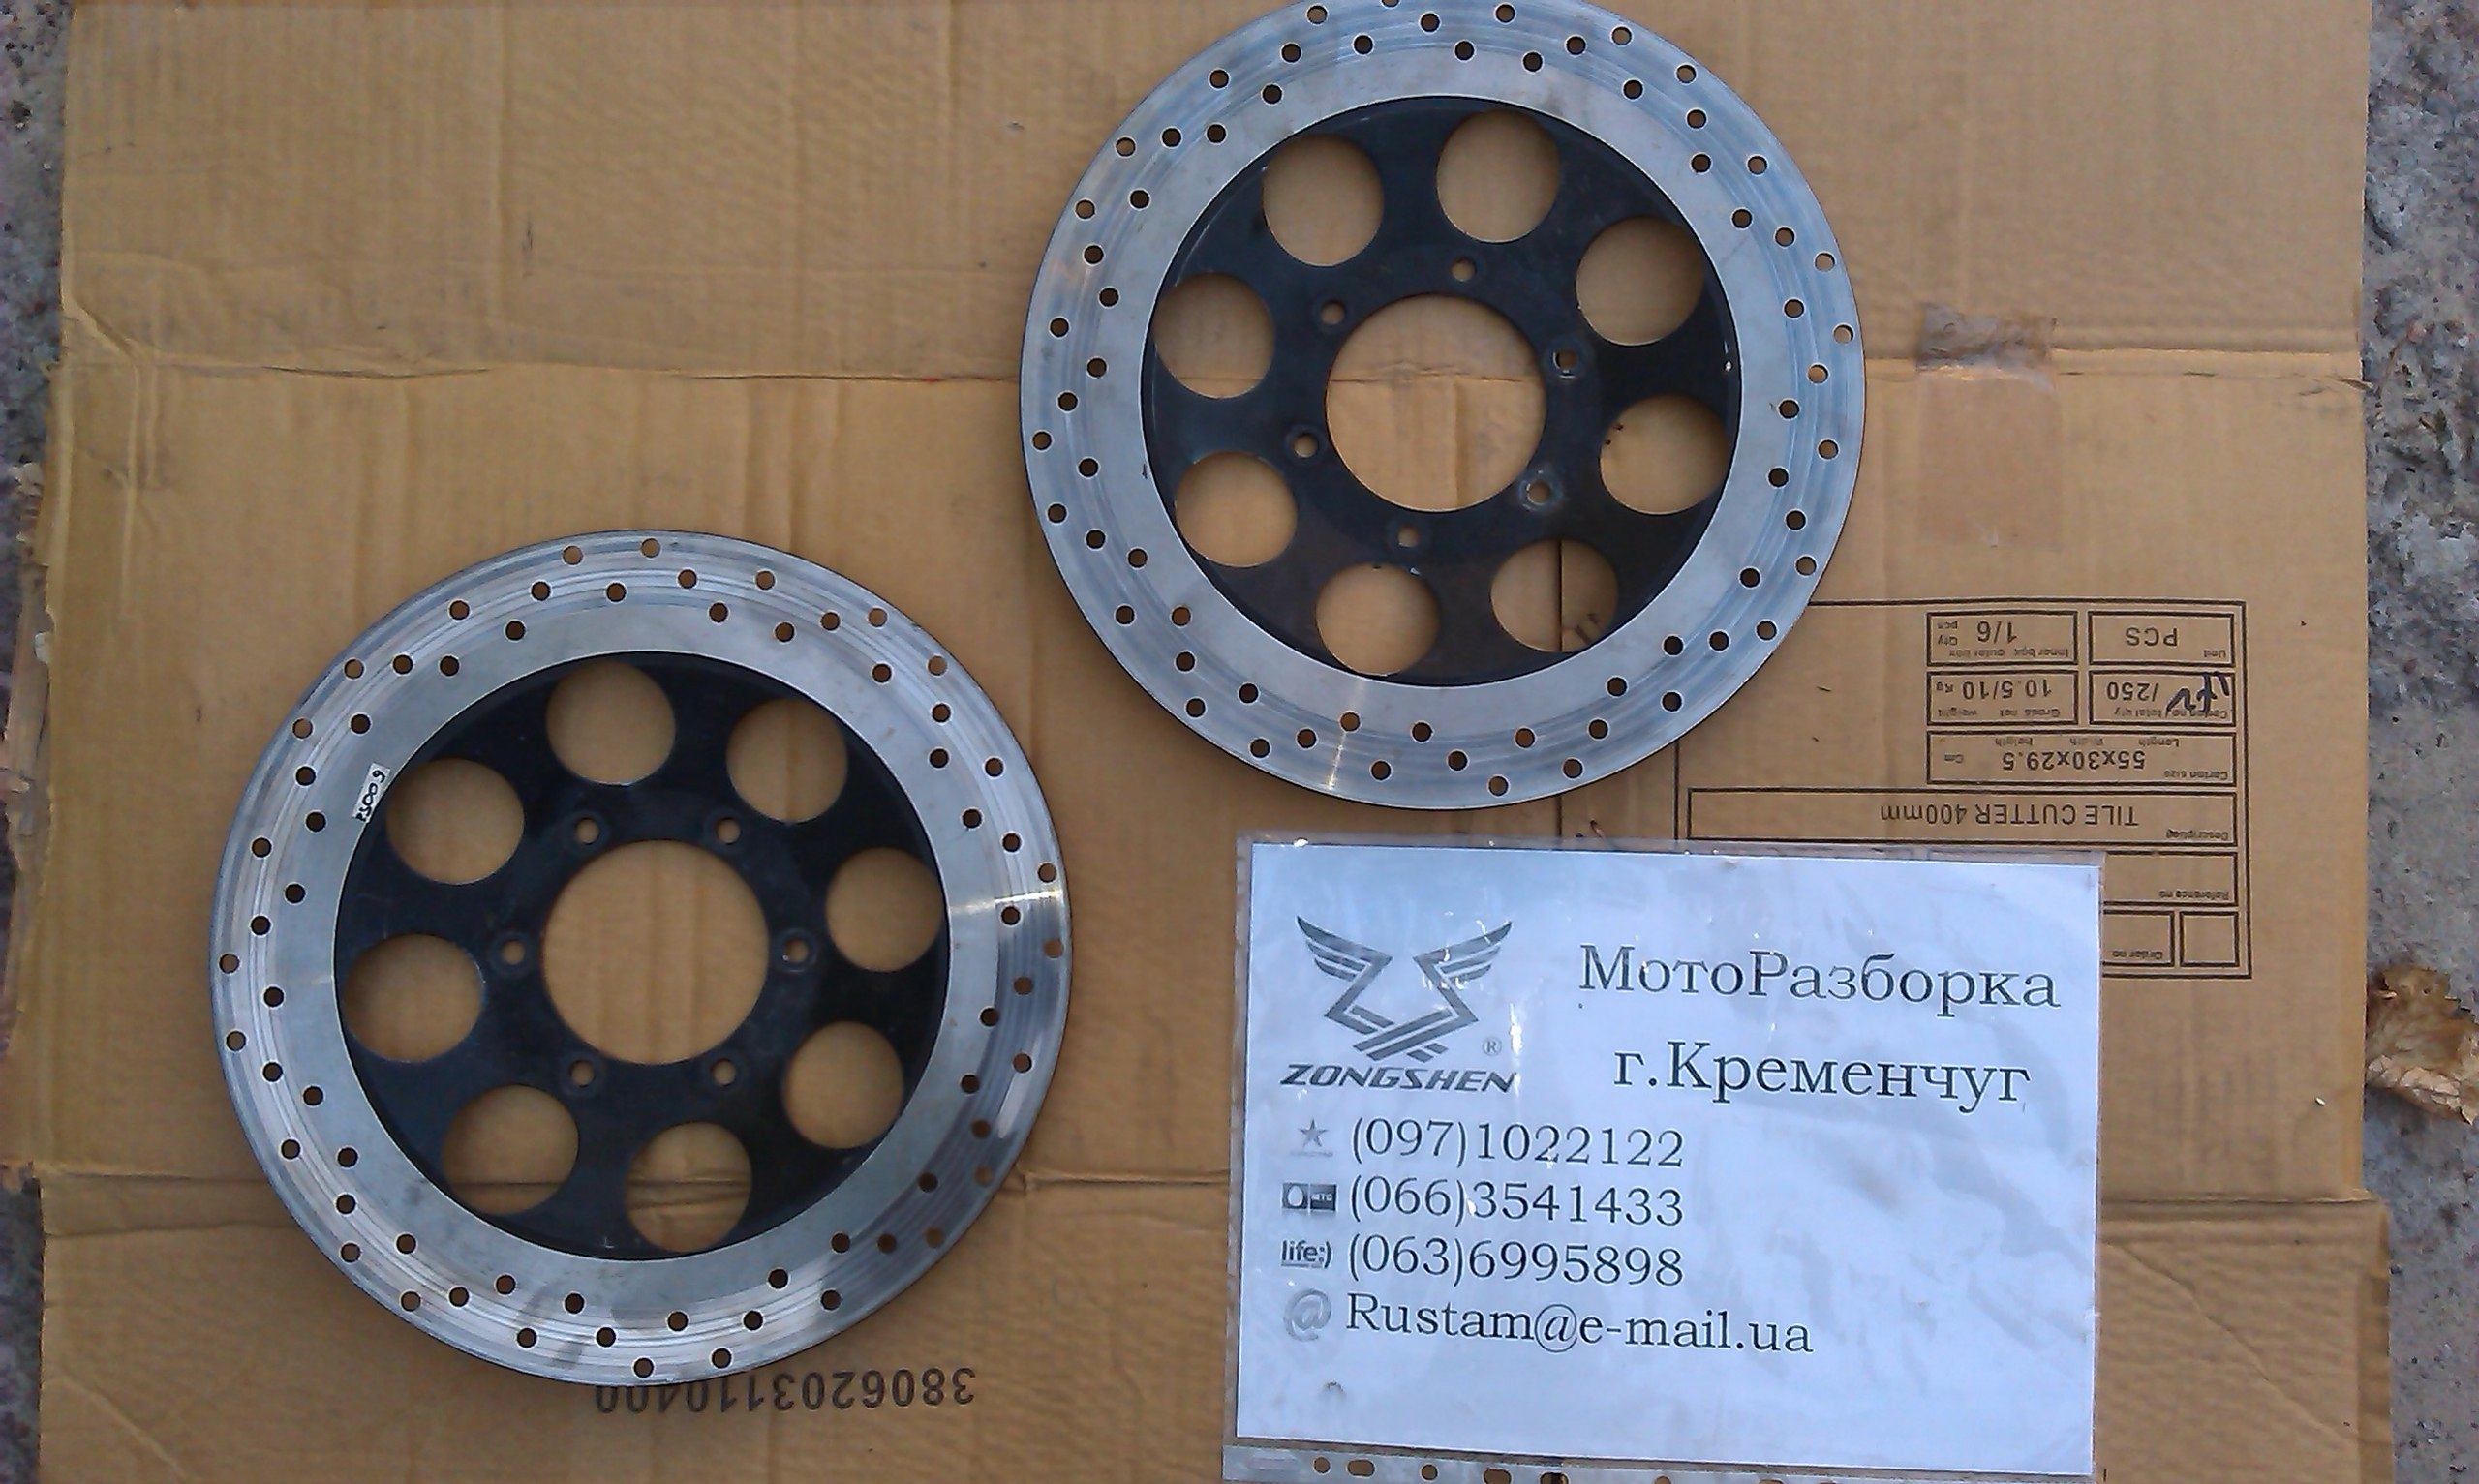 МотоРазборка г.Кременчуг Zongshen 200-250, Suzuki bandit 400-1, Venom 200 RGaK9_0HkBI